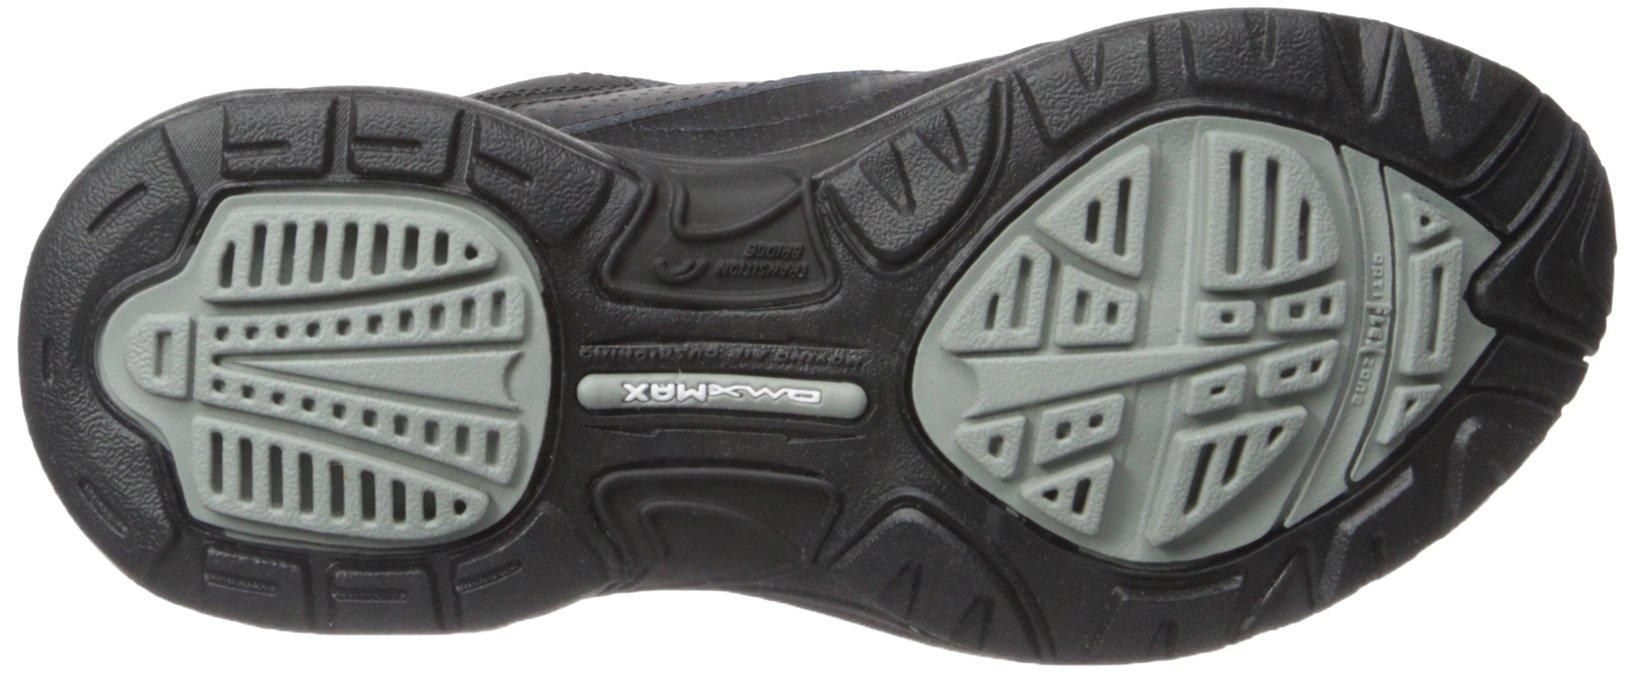 4c0a7ed4de09 Reebok Women s Ultra V Dmx Max Walking Shoe